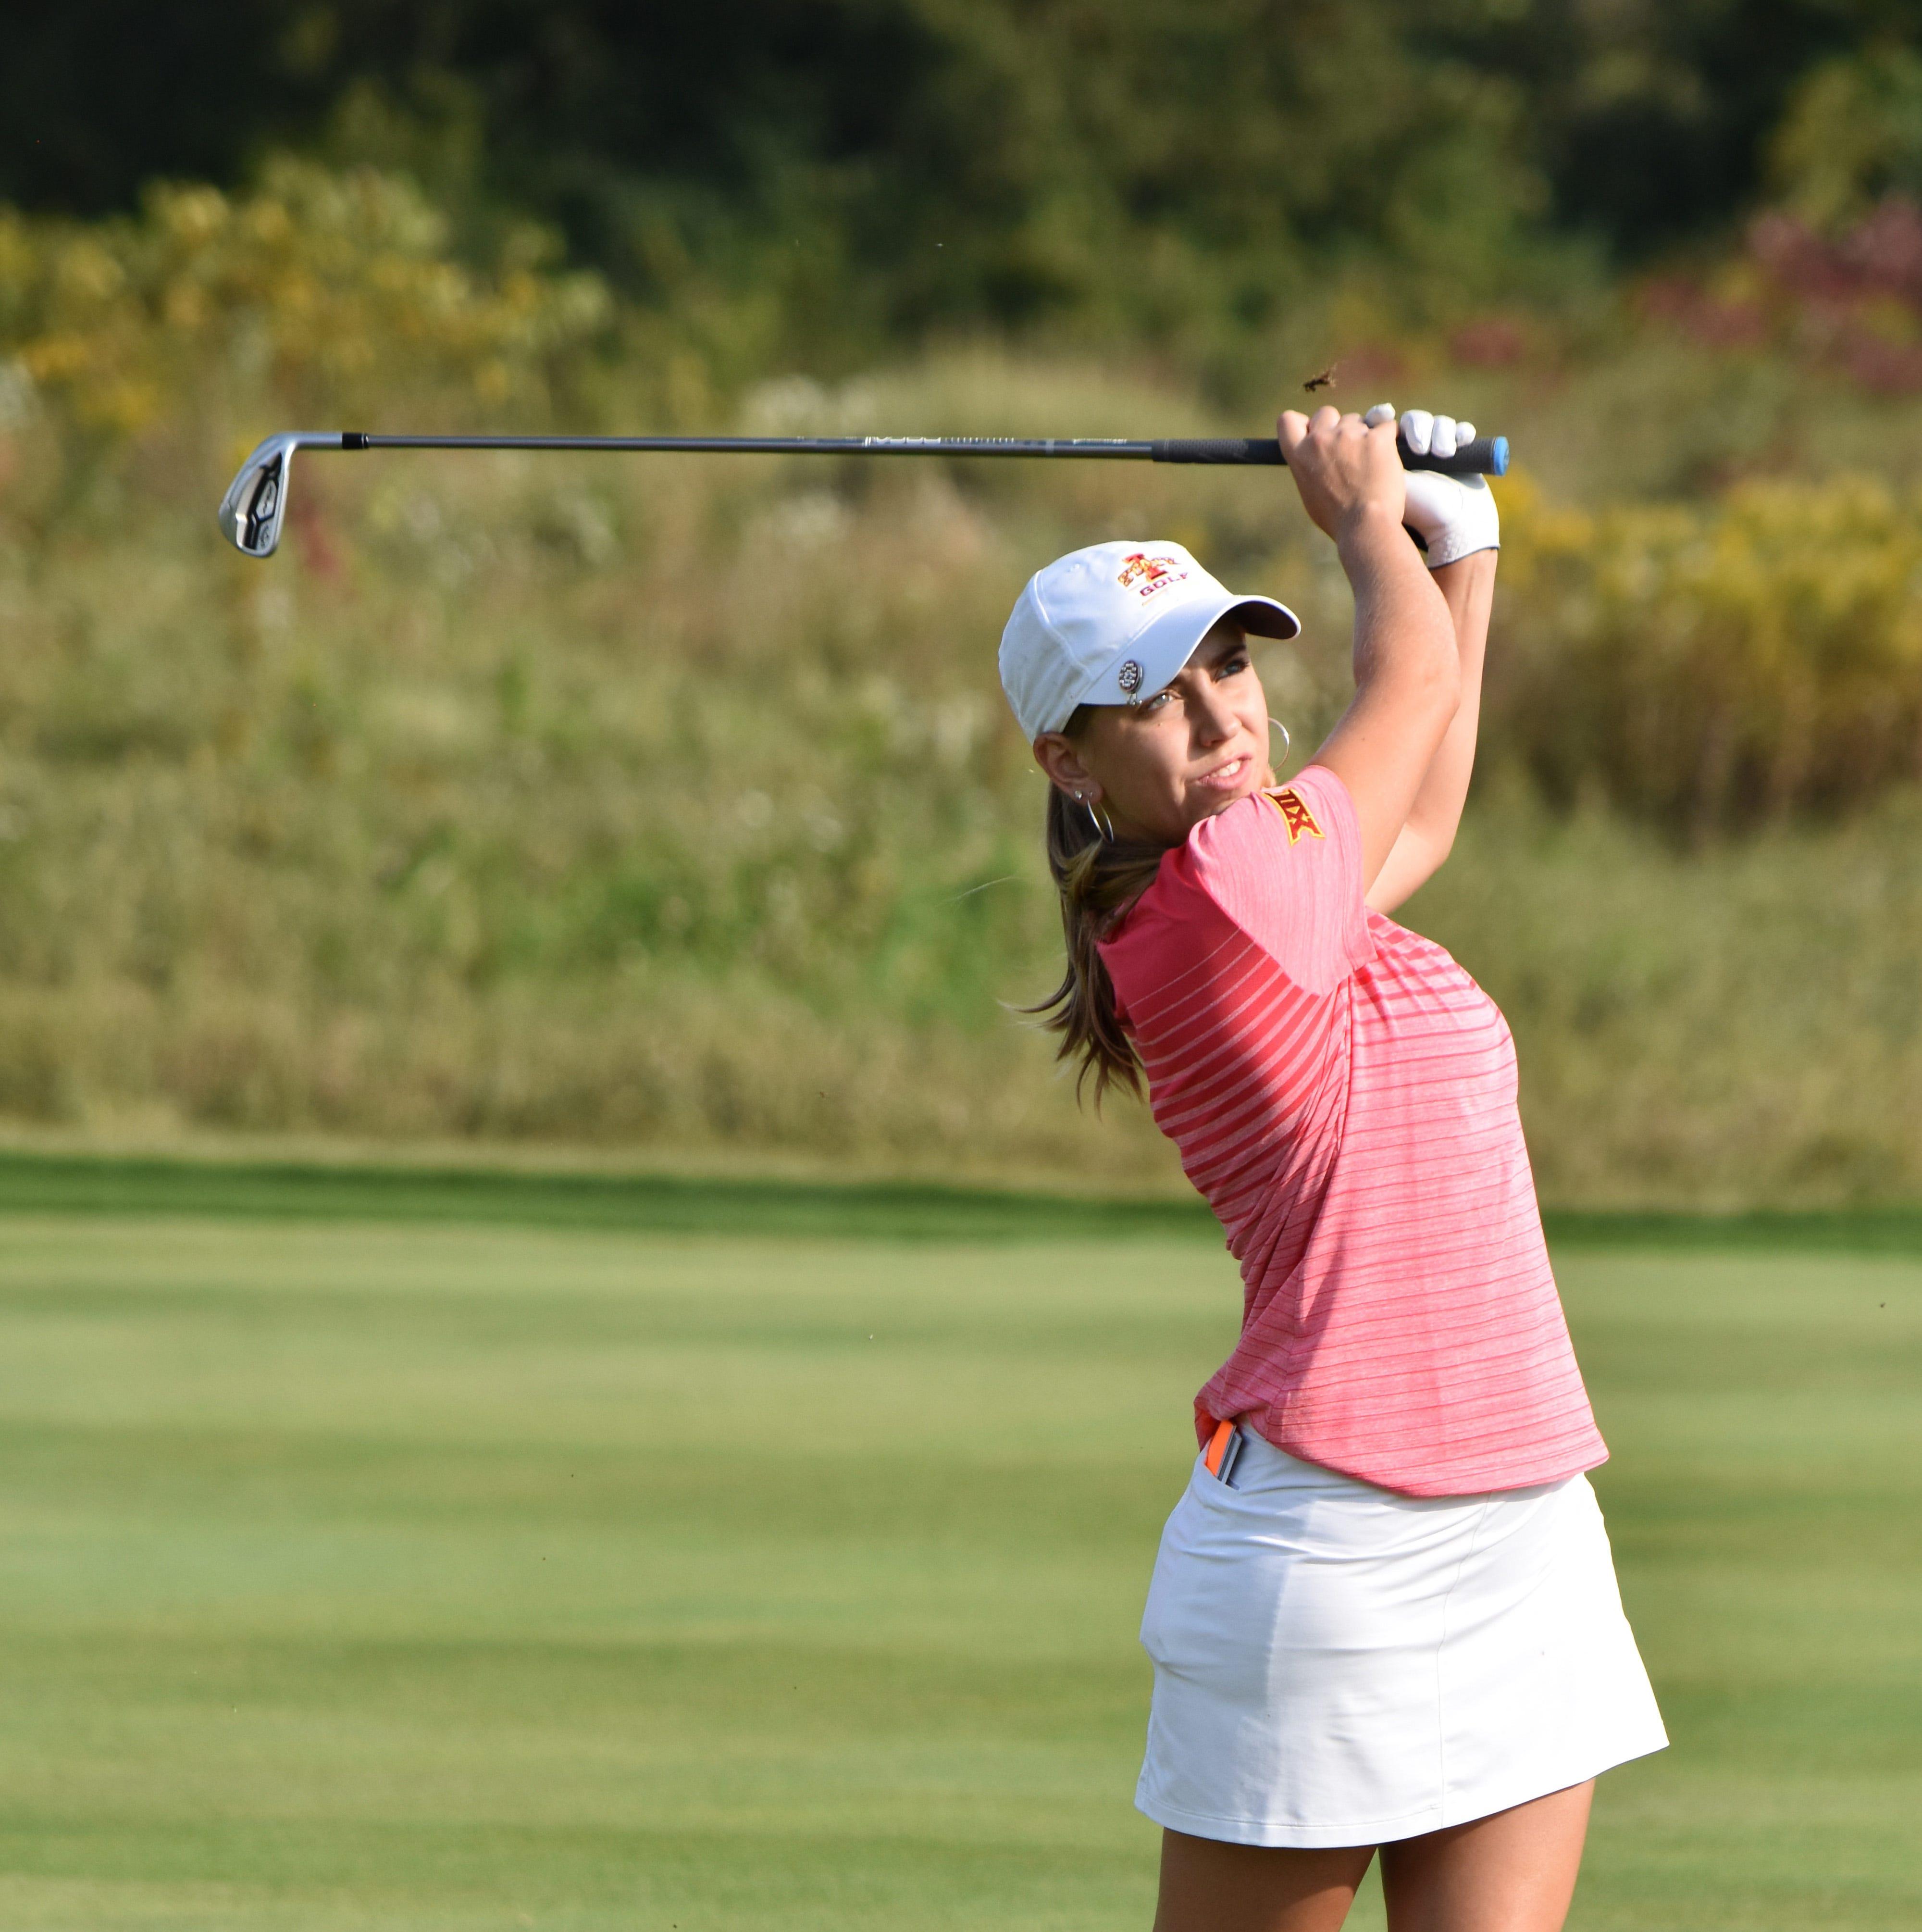 Sergio Garcia dedicates round to Celia Barquin Arozamena, slain Iowa State golfer